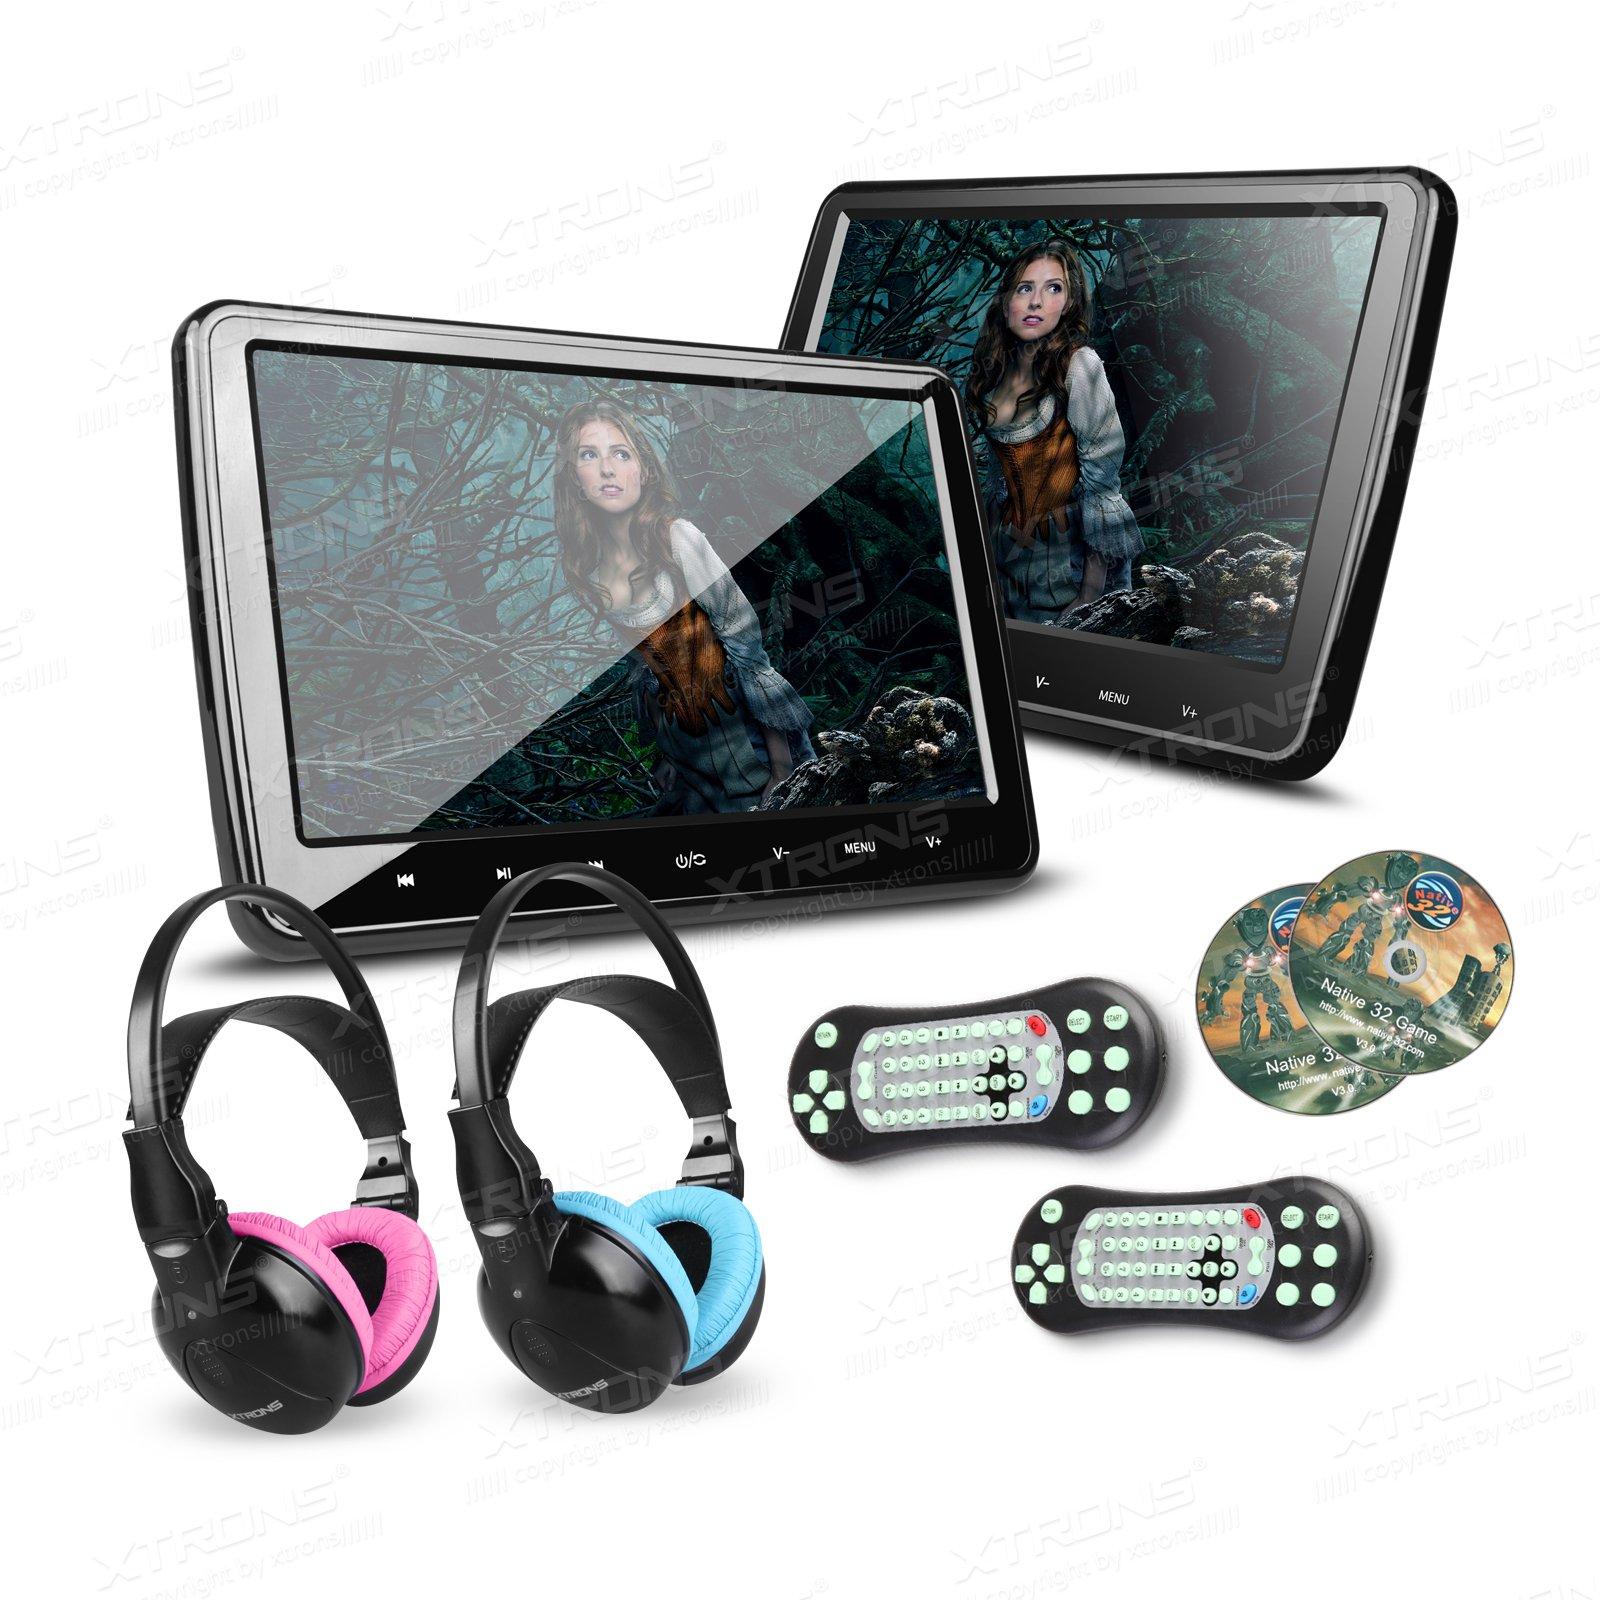 XTRONS 2X 10.1 Inch Twins HD Digital Screen Car Headrest DVD Player Ultra-Thin Detachable Touch Button HDMI Port with One Pair of Children IR Headphones(Blue&Pink)